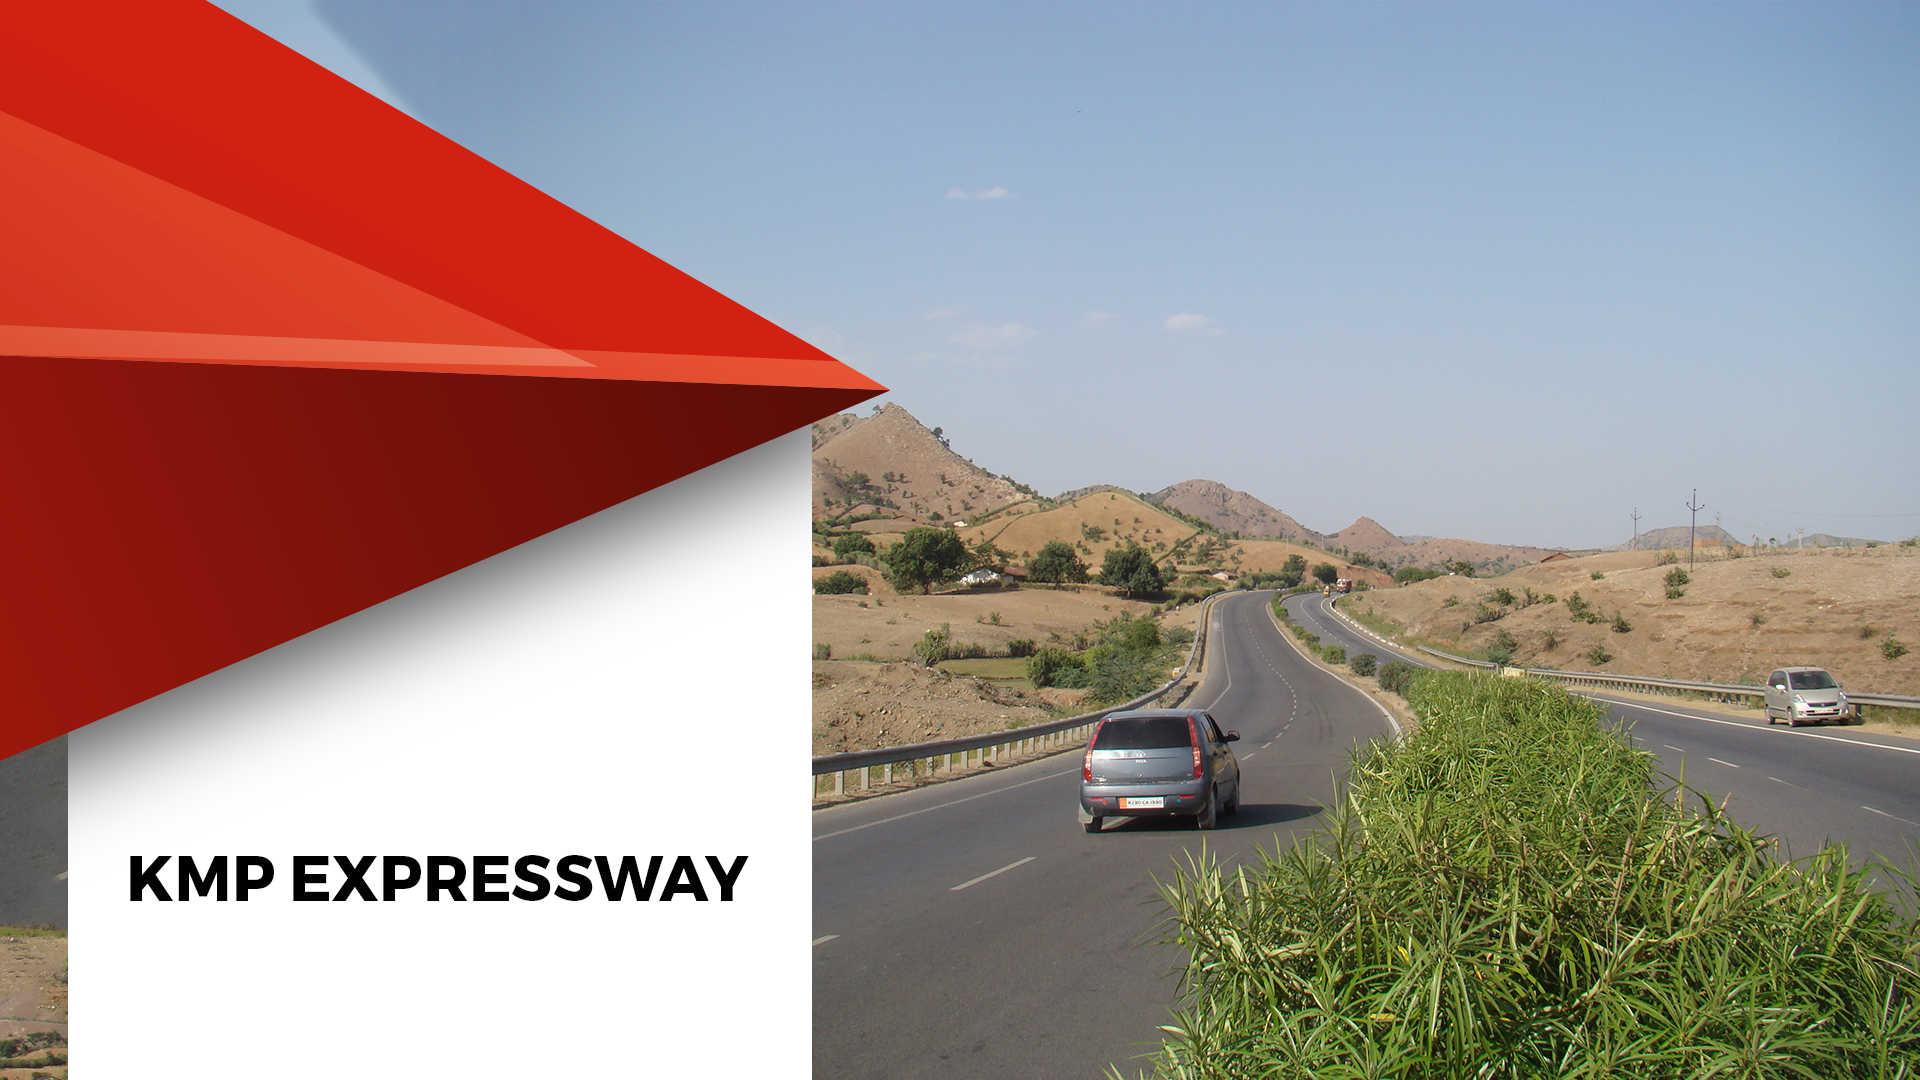 KMP Expressway, NCR – Caution, Work in Progress!